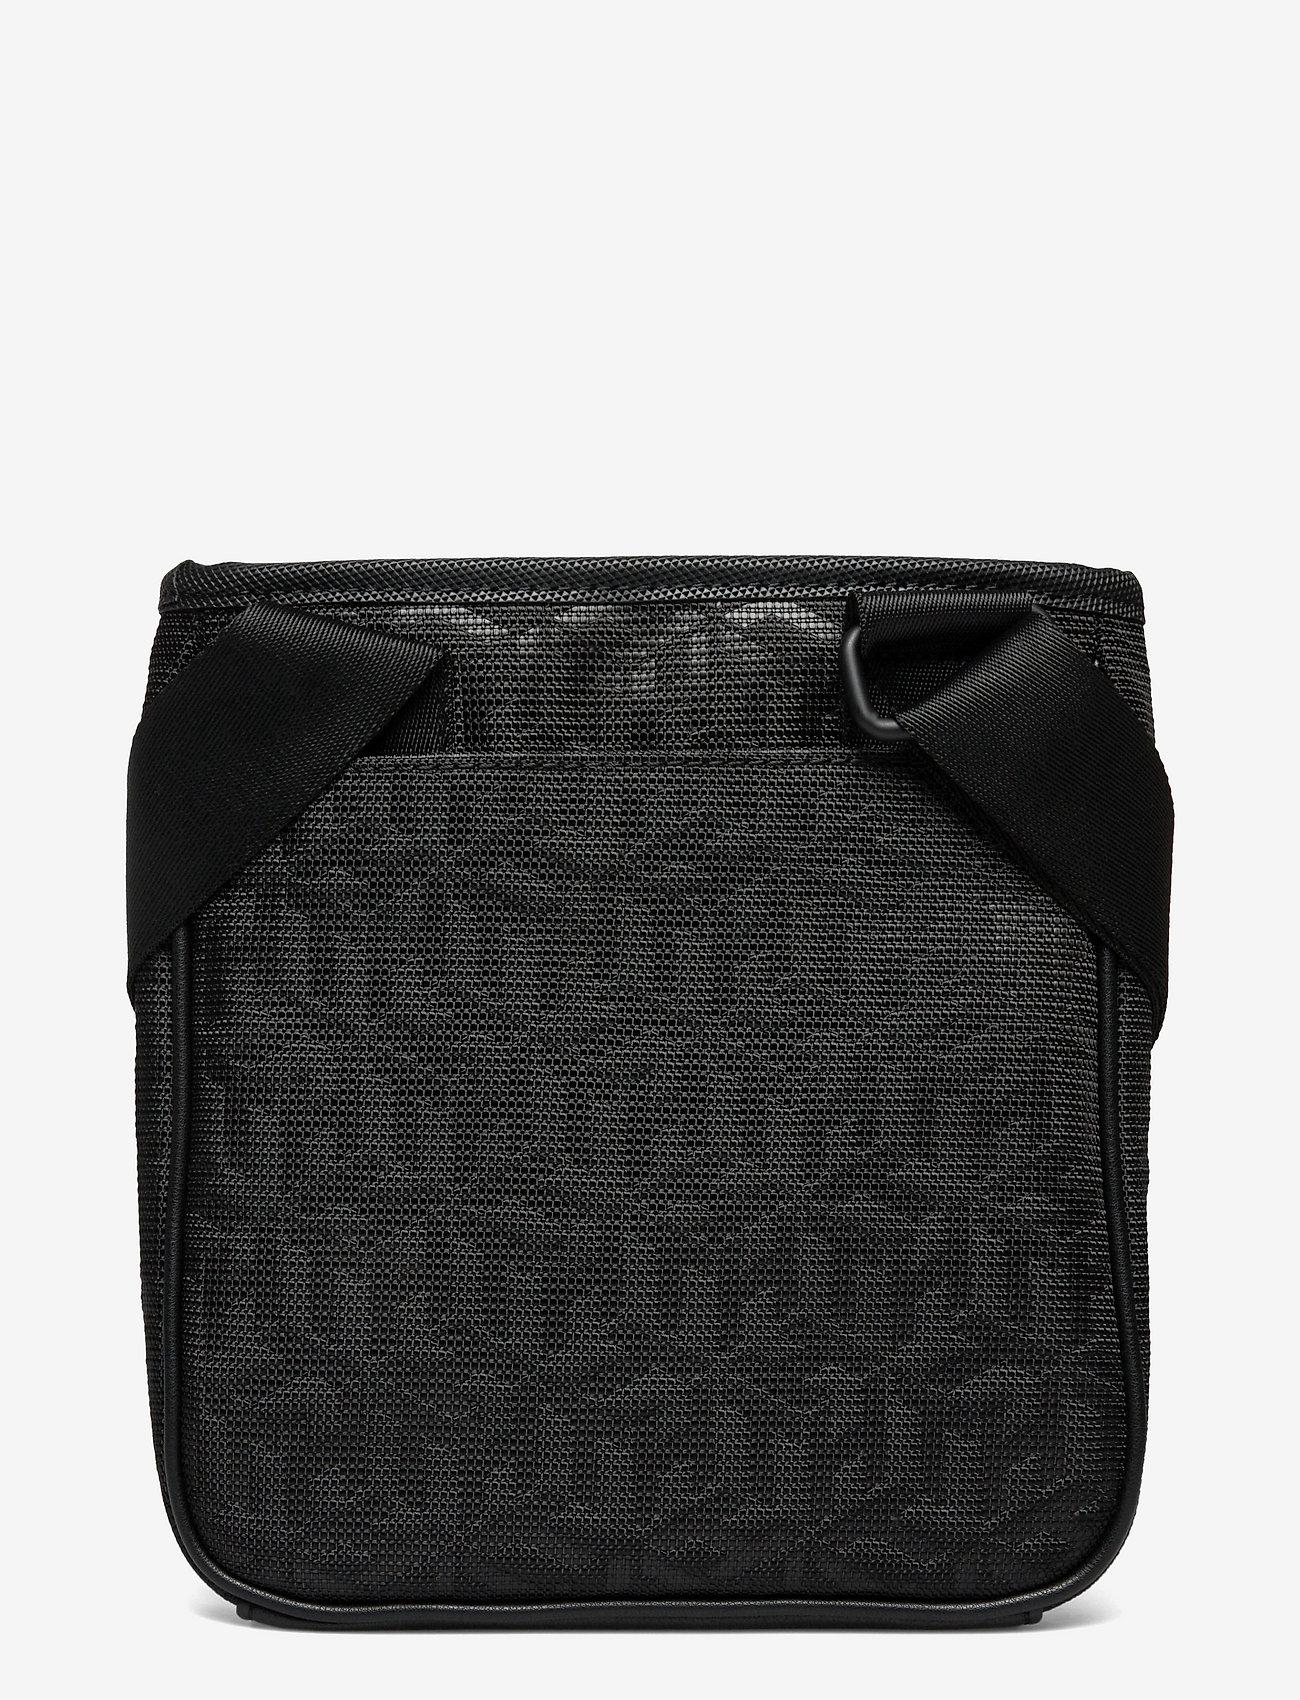 Tommy Hilfiger - ELEVATED NYLON MINI CROSSOV MONO - shoulder bags - black monogram - 1